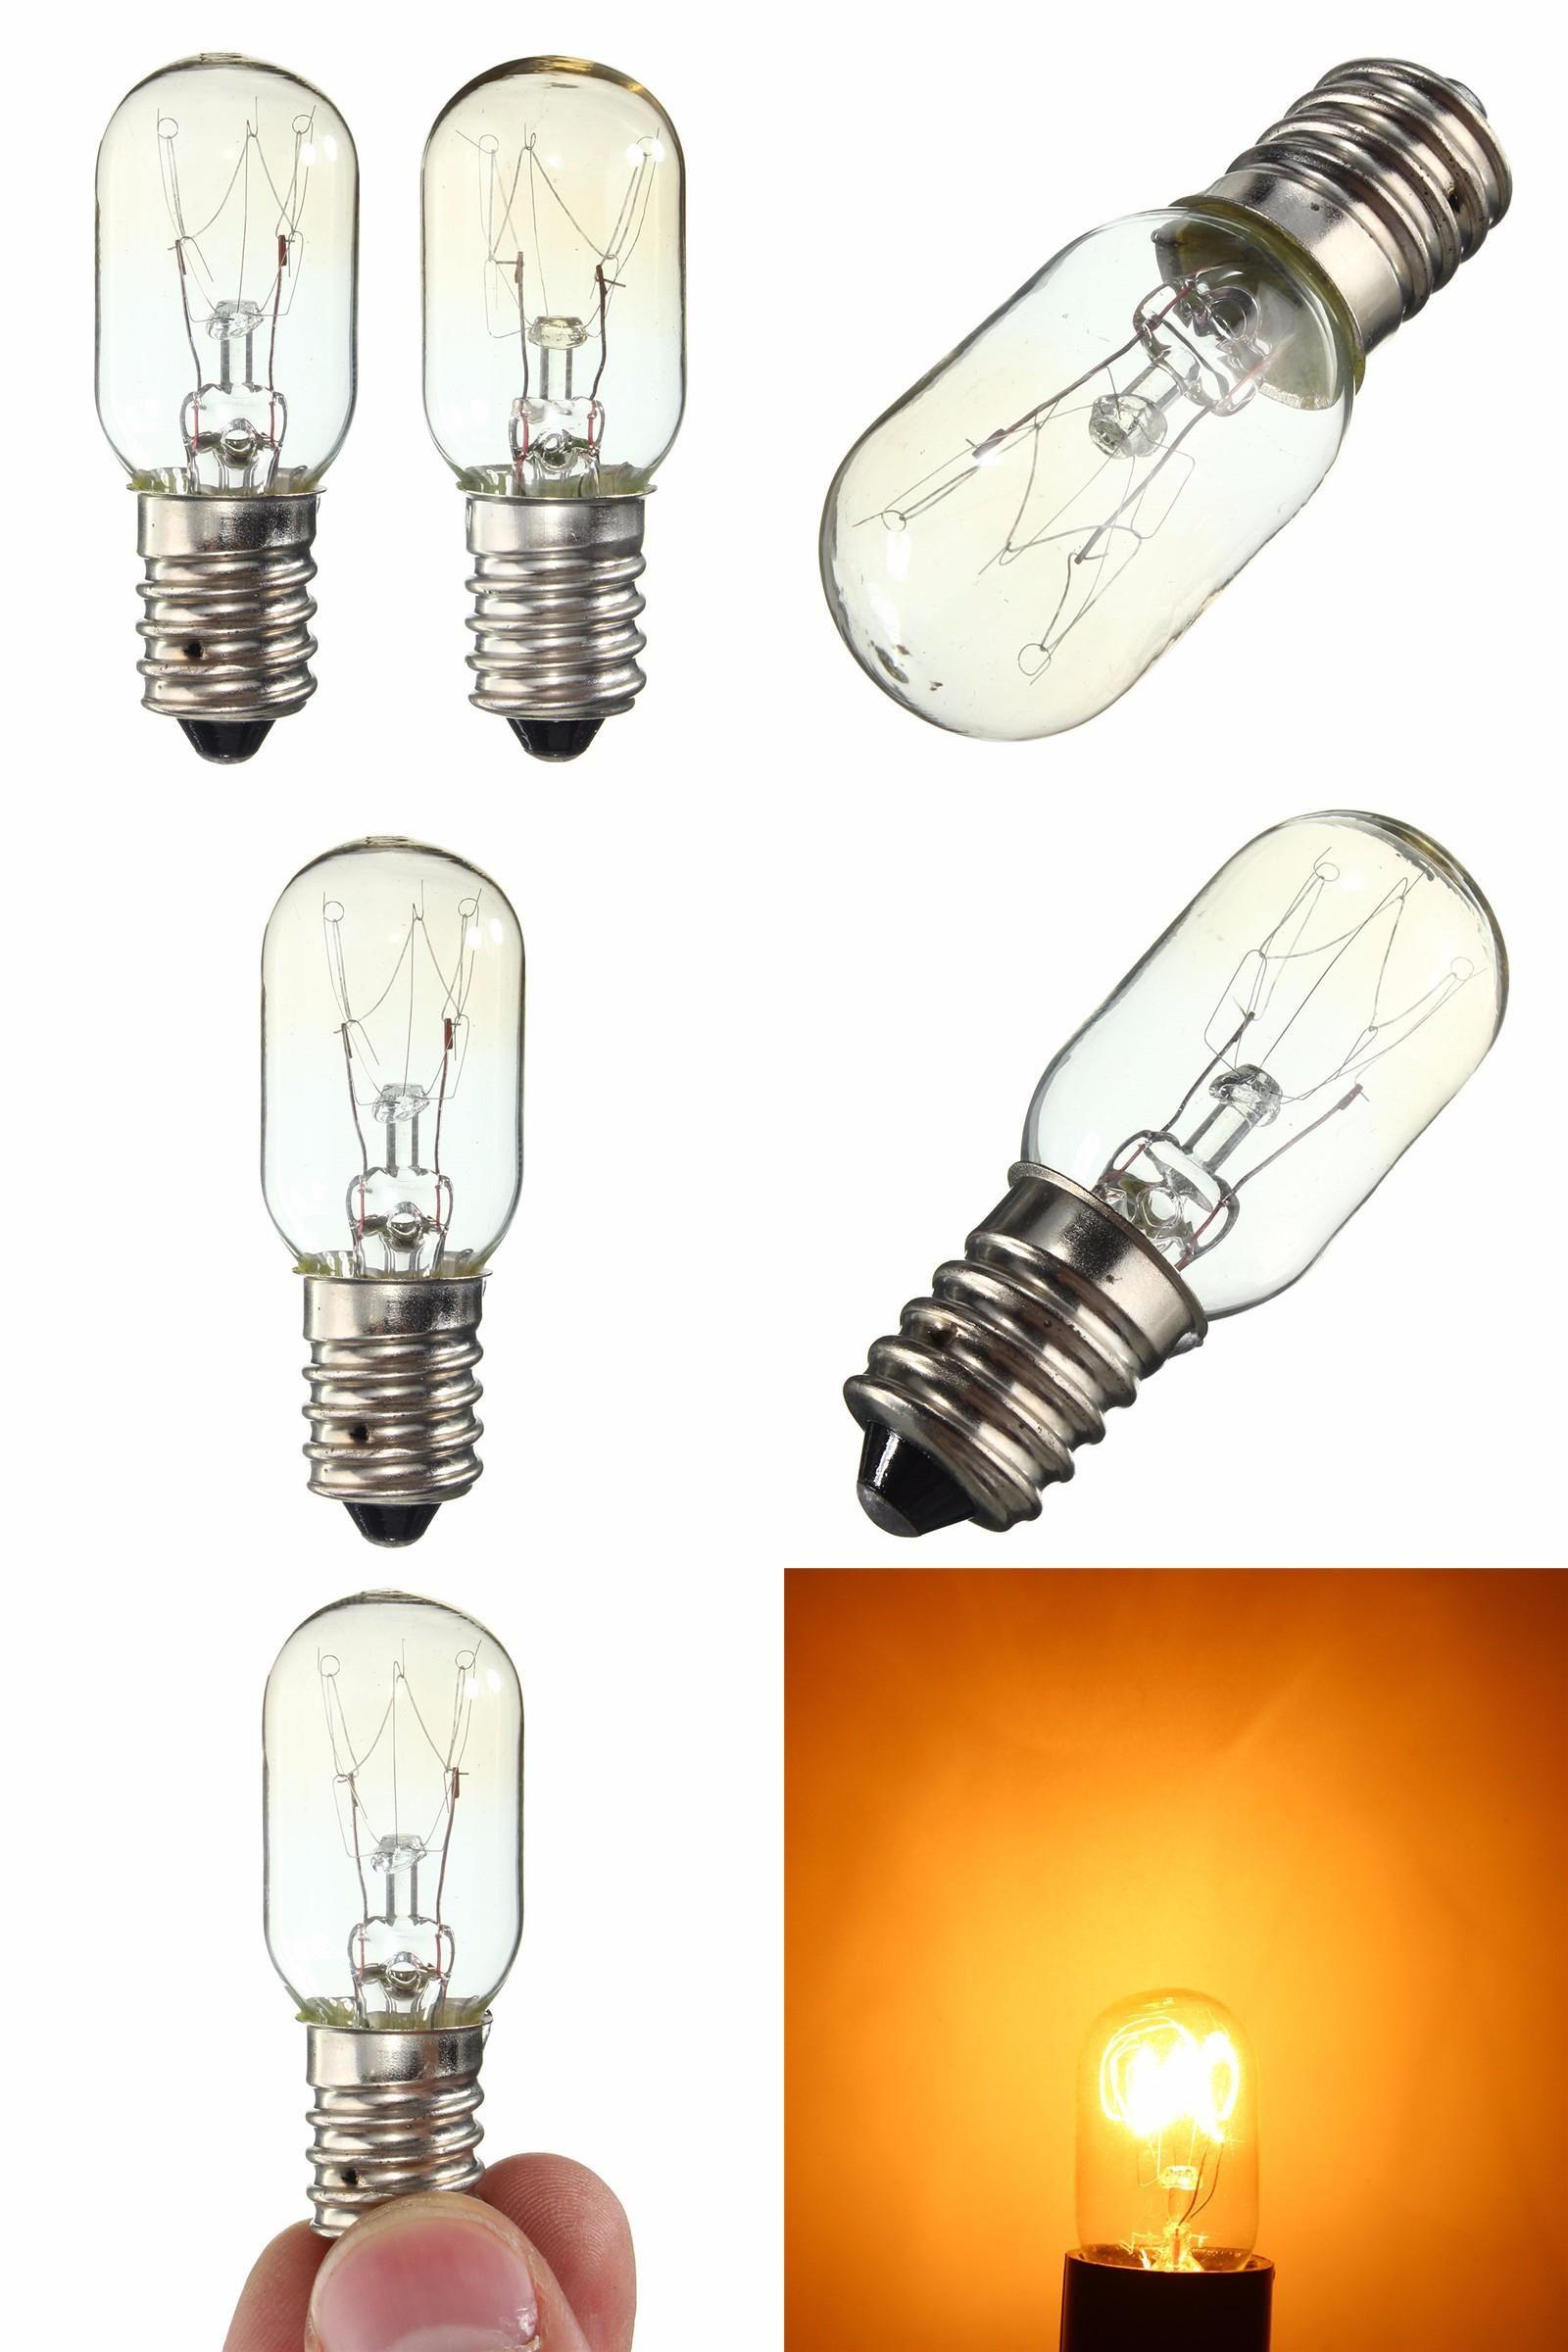 Visit To Buy Edison Bulb E14 Ses 15w 25w Refrigerator Fridge Light Tungsten Filament Lamp Bulbs Warm White Ligthing Ac220 230v Ad Lamp Bulb Edison Bulb Bulb